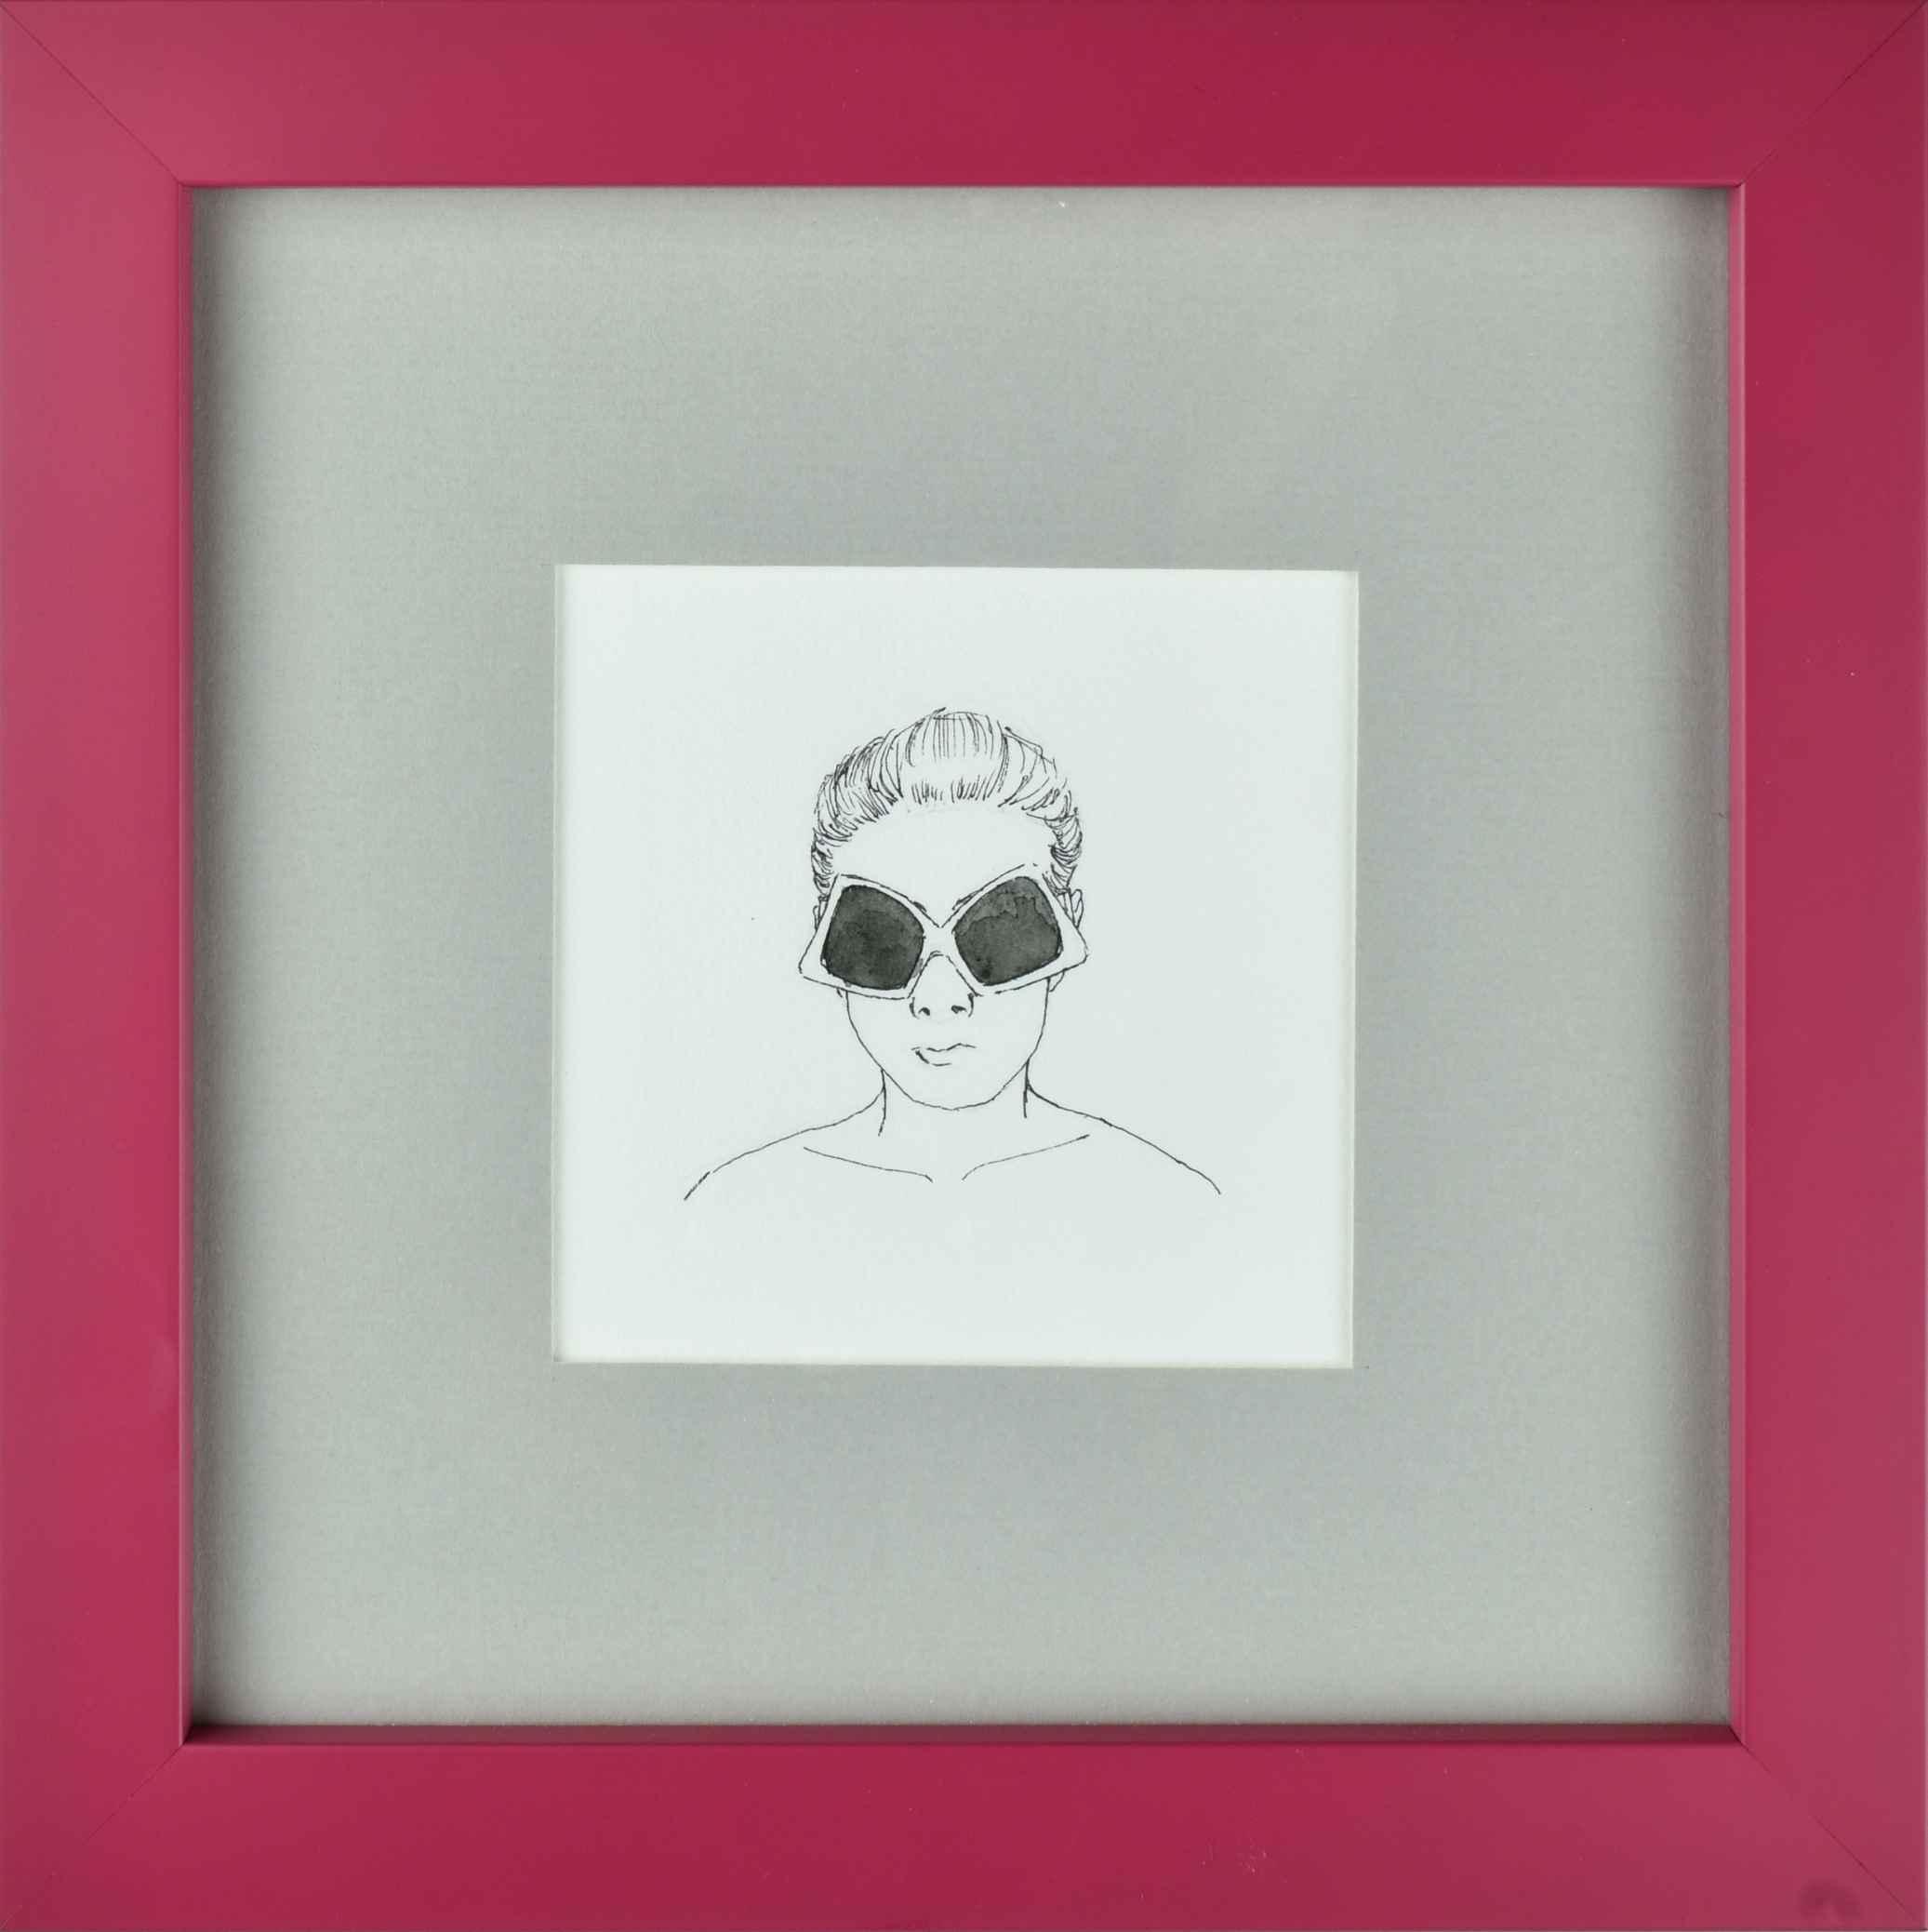 Sunglasses 3 by  Jill Hakala - Masterpiece Online